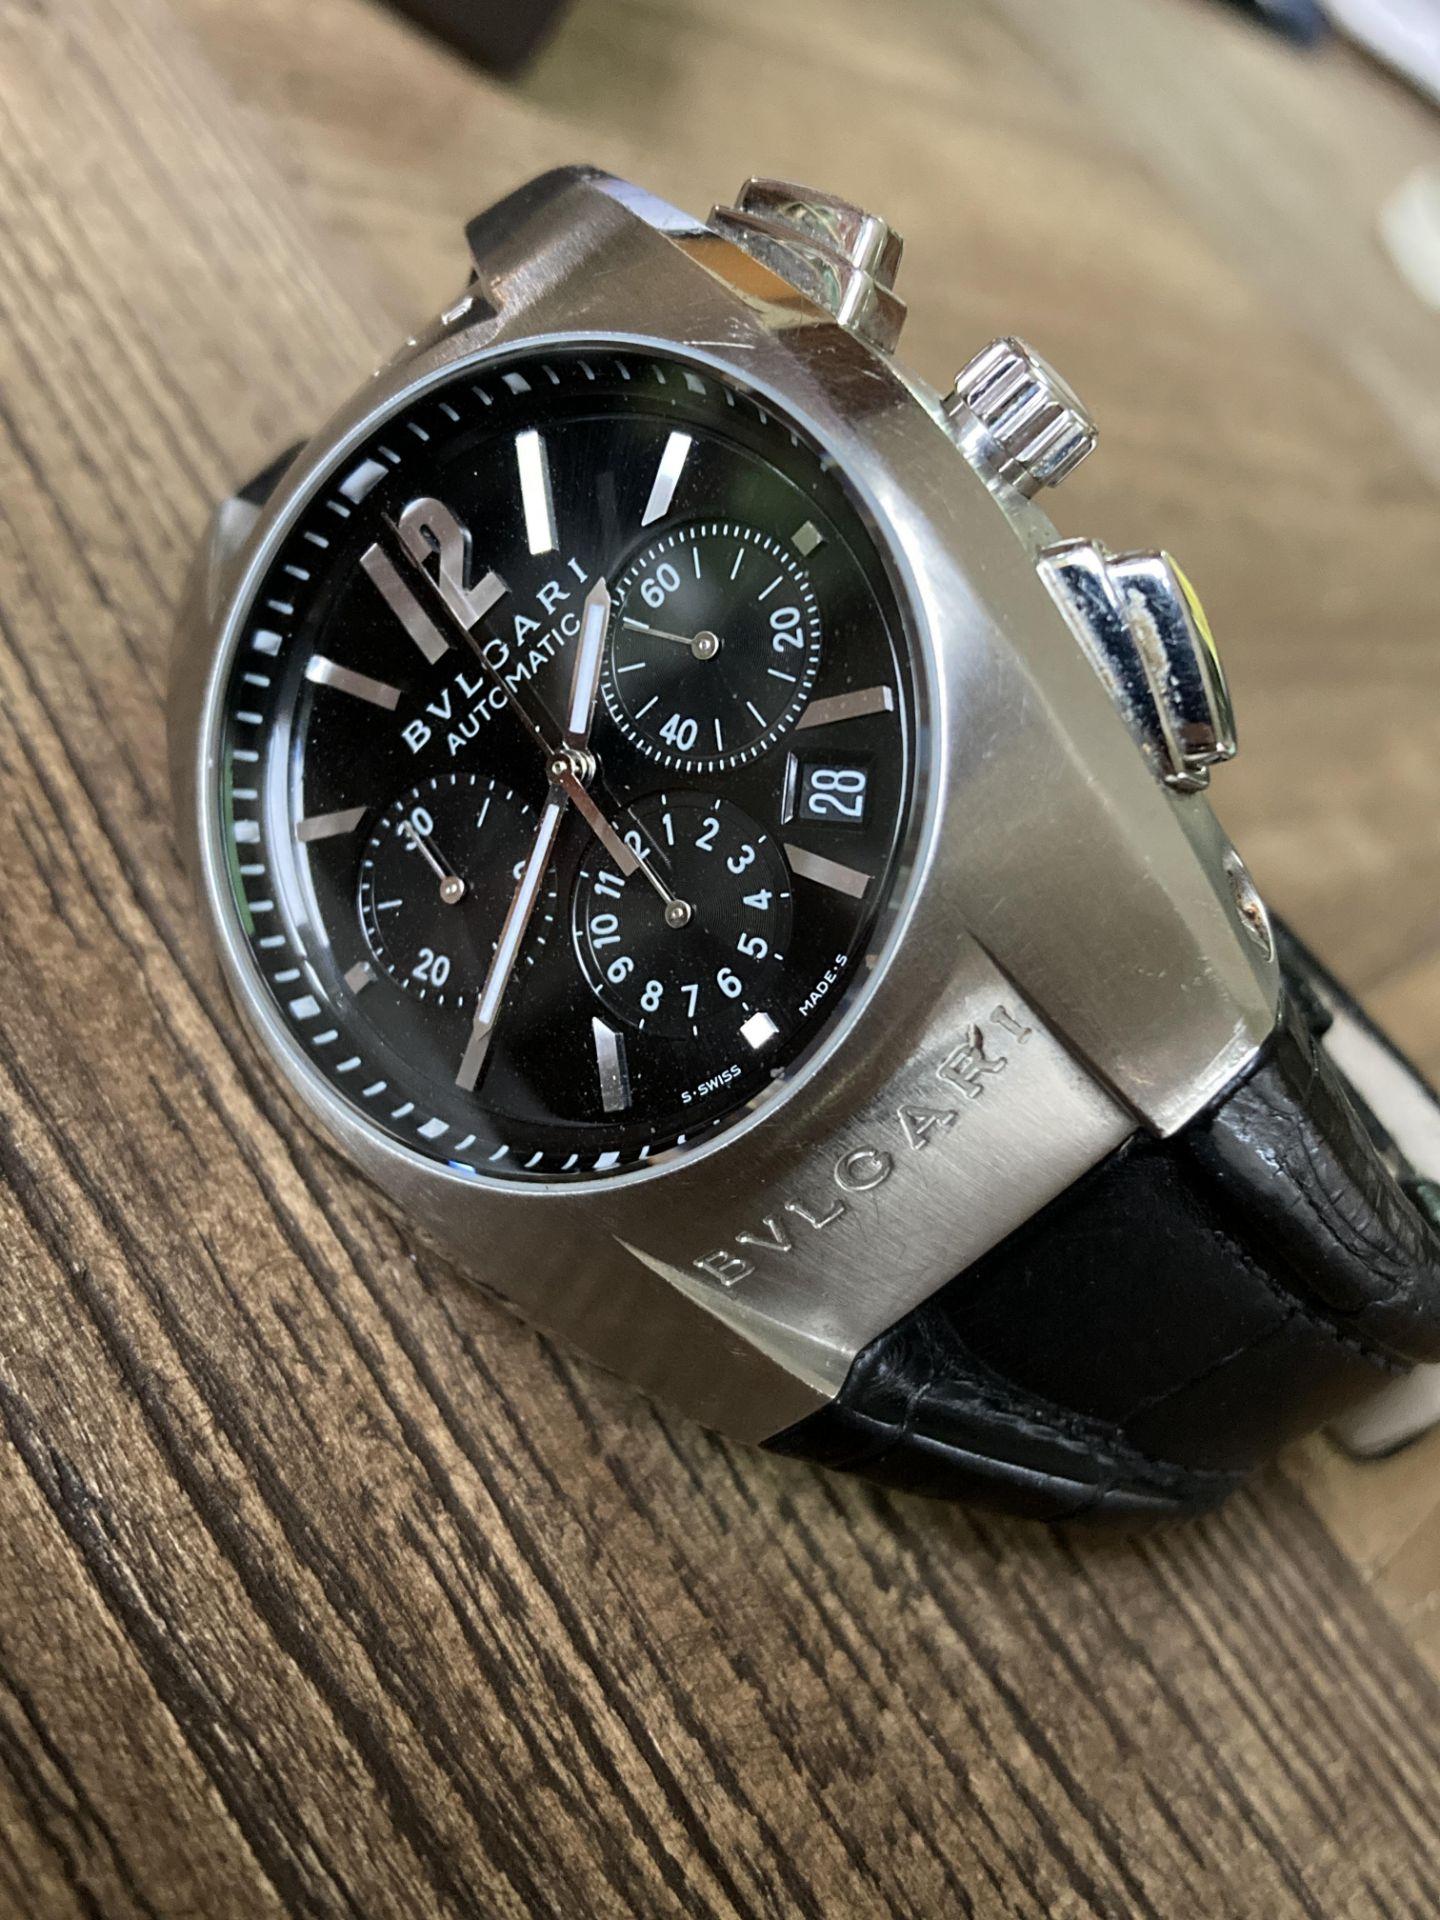 BVLGARI CHRONO AUTOMATIC WATCH - 40MM